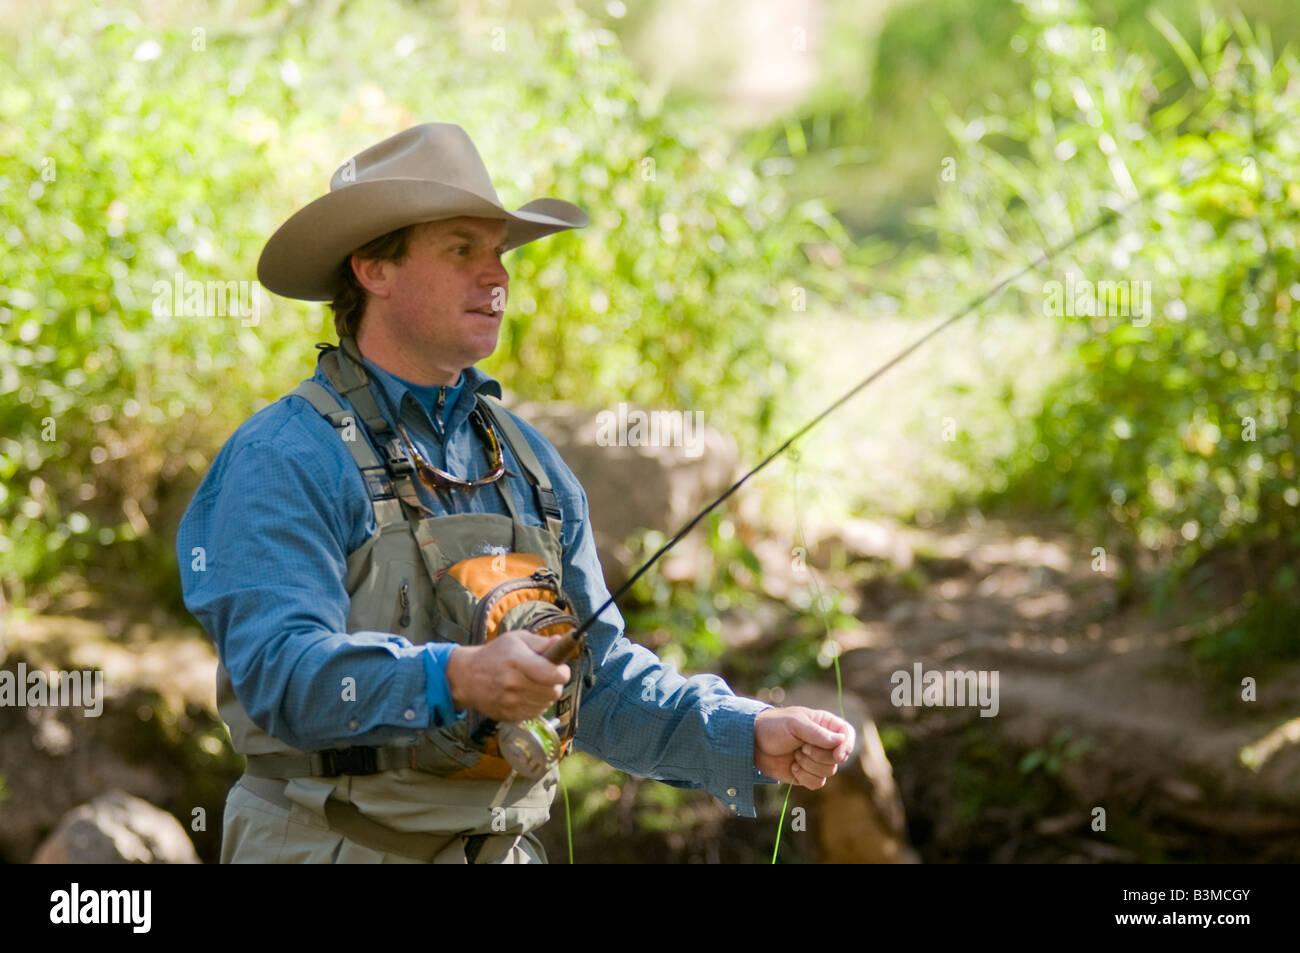 Residente Local volar peces truchas en Gore Creek, Vail, Colorado, en agosto. Imagen De Stock